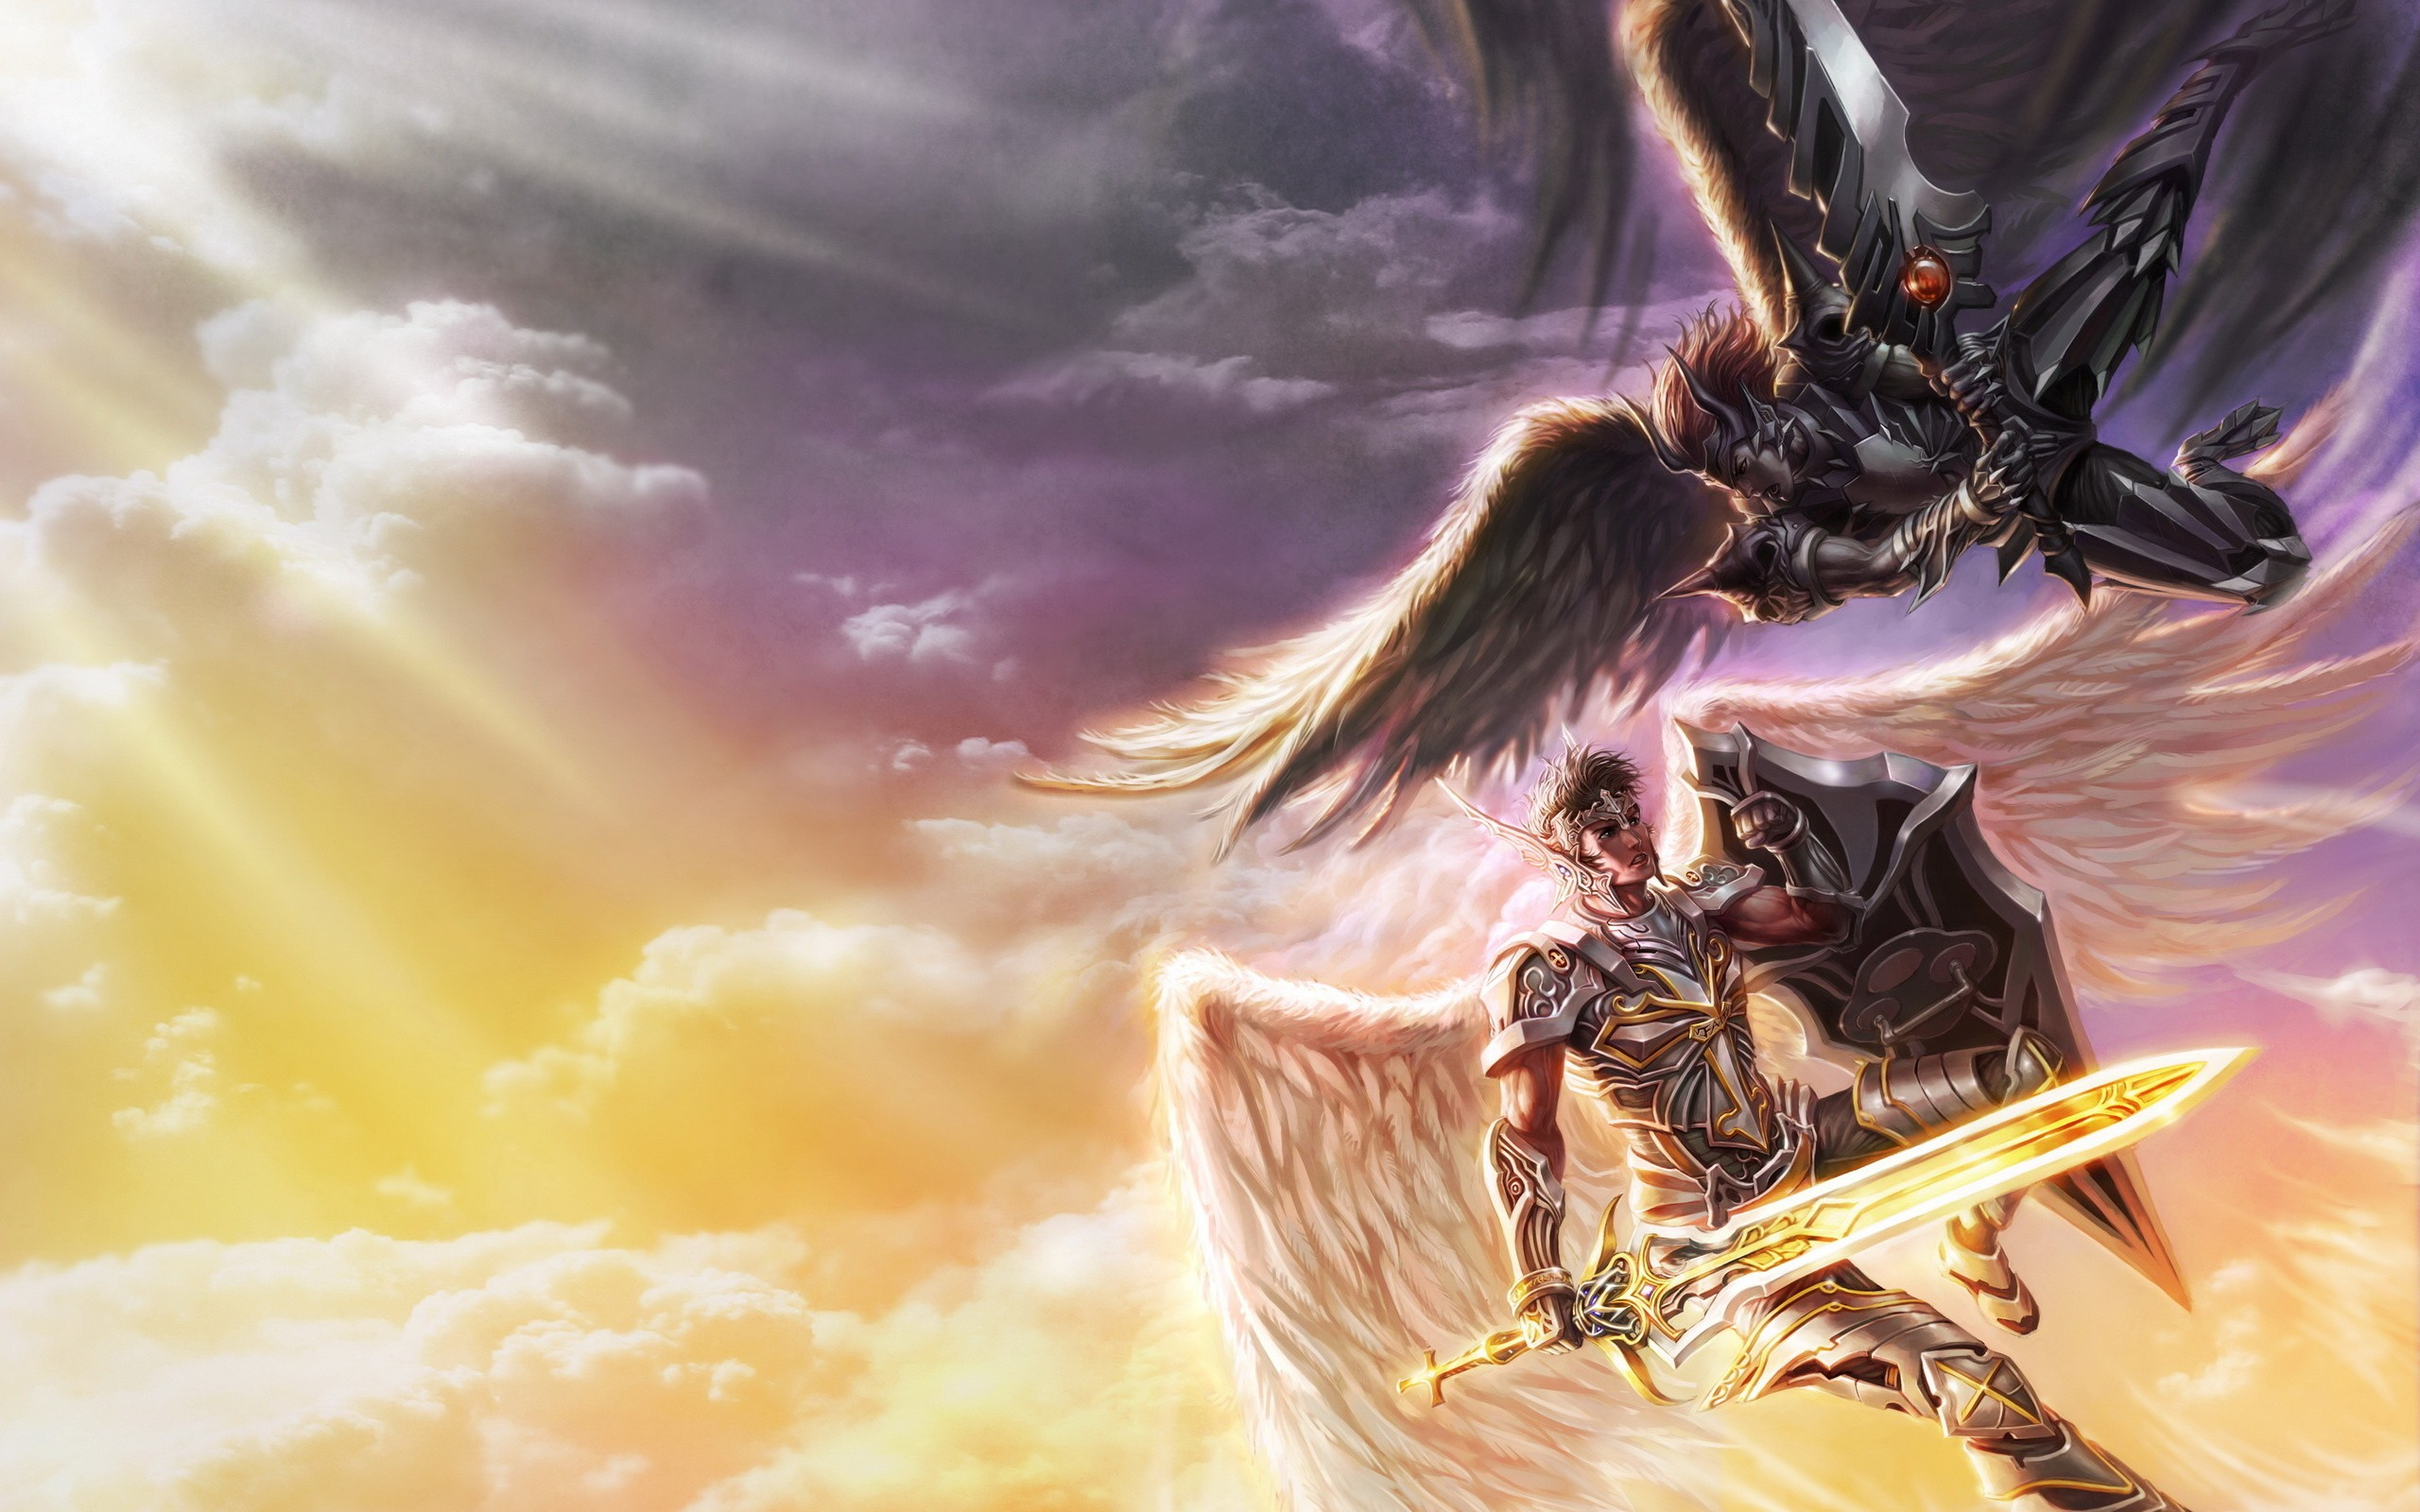 Archangel Michael Hd Wallpaper Angel Warrior Full Hd Wallpaper And Background Image